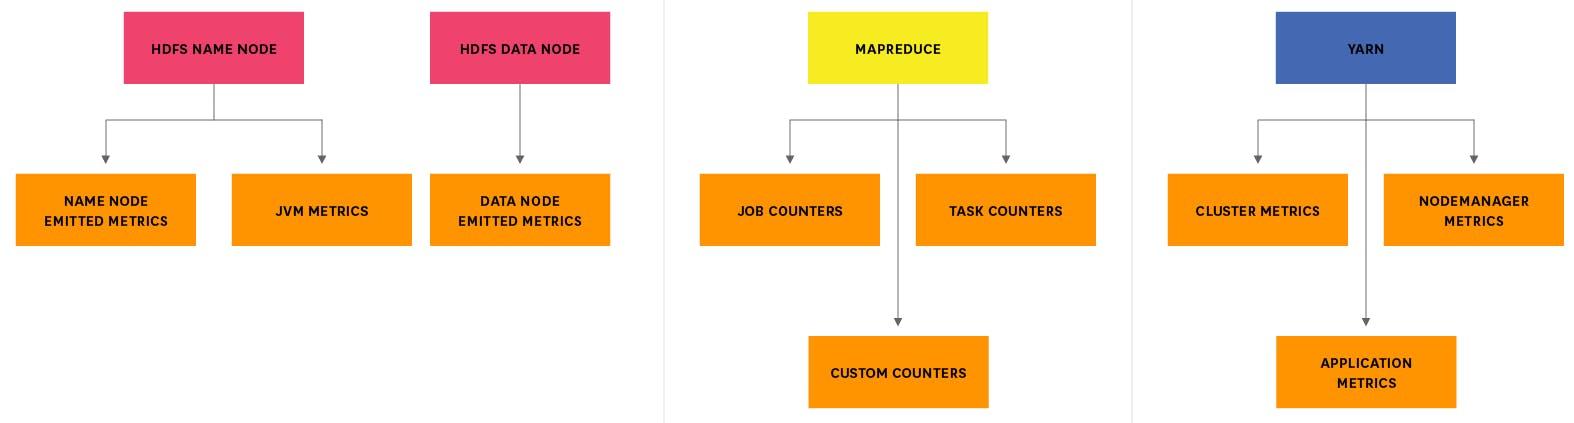 How to monitor Hadoop metrics | Datadog